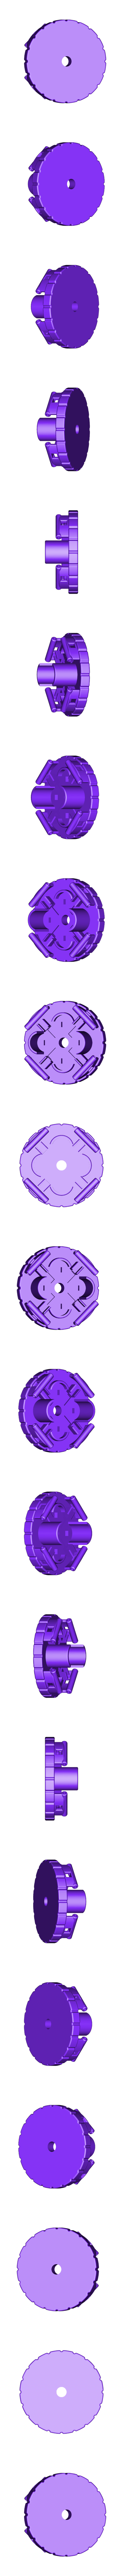 mid-body.stl Download free STL file Mechnolia • 3D printing template, ChrisBobo